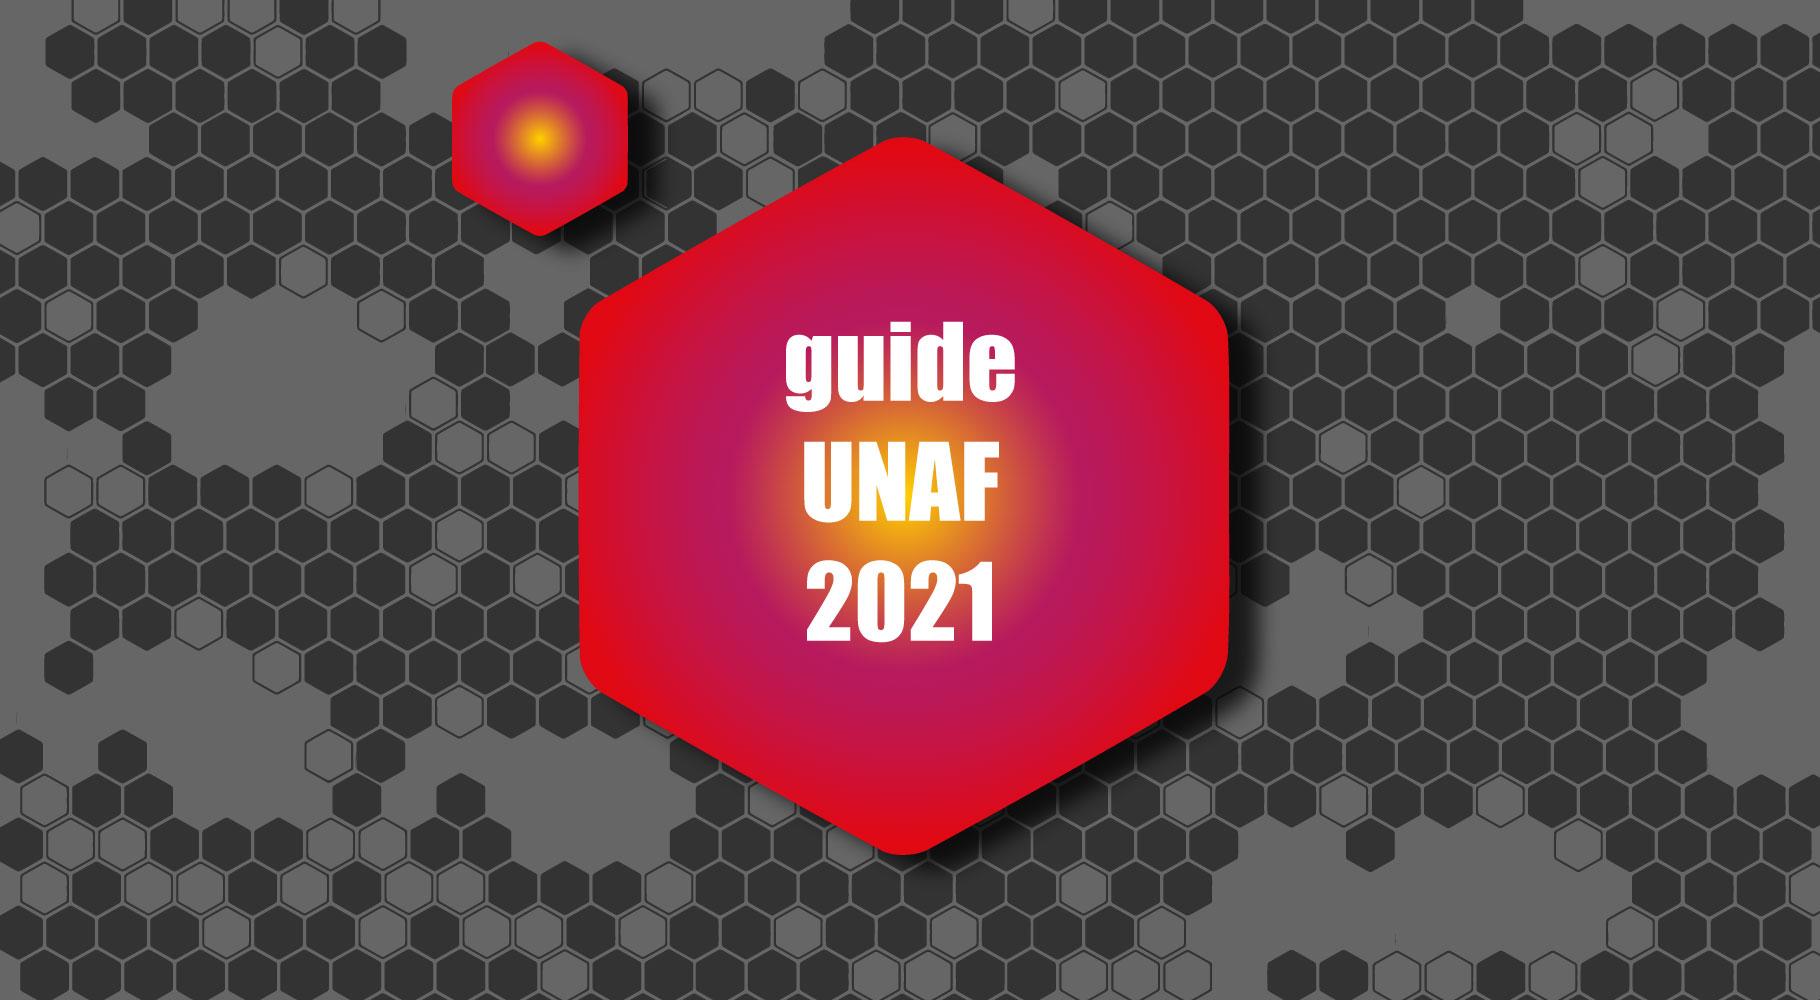 Guide UNAF 2021 - Frelon asiatique